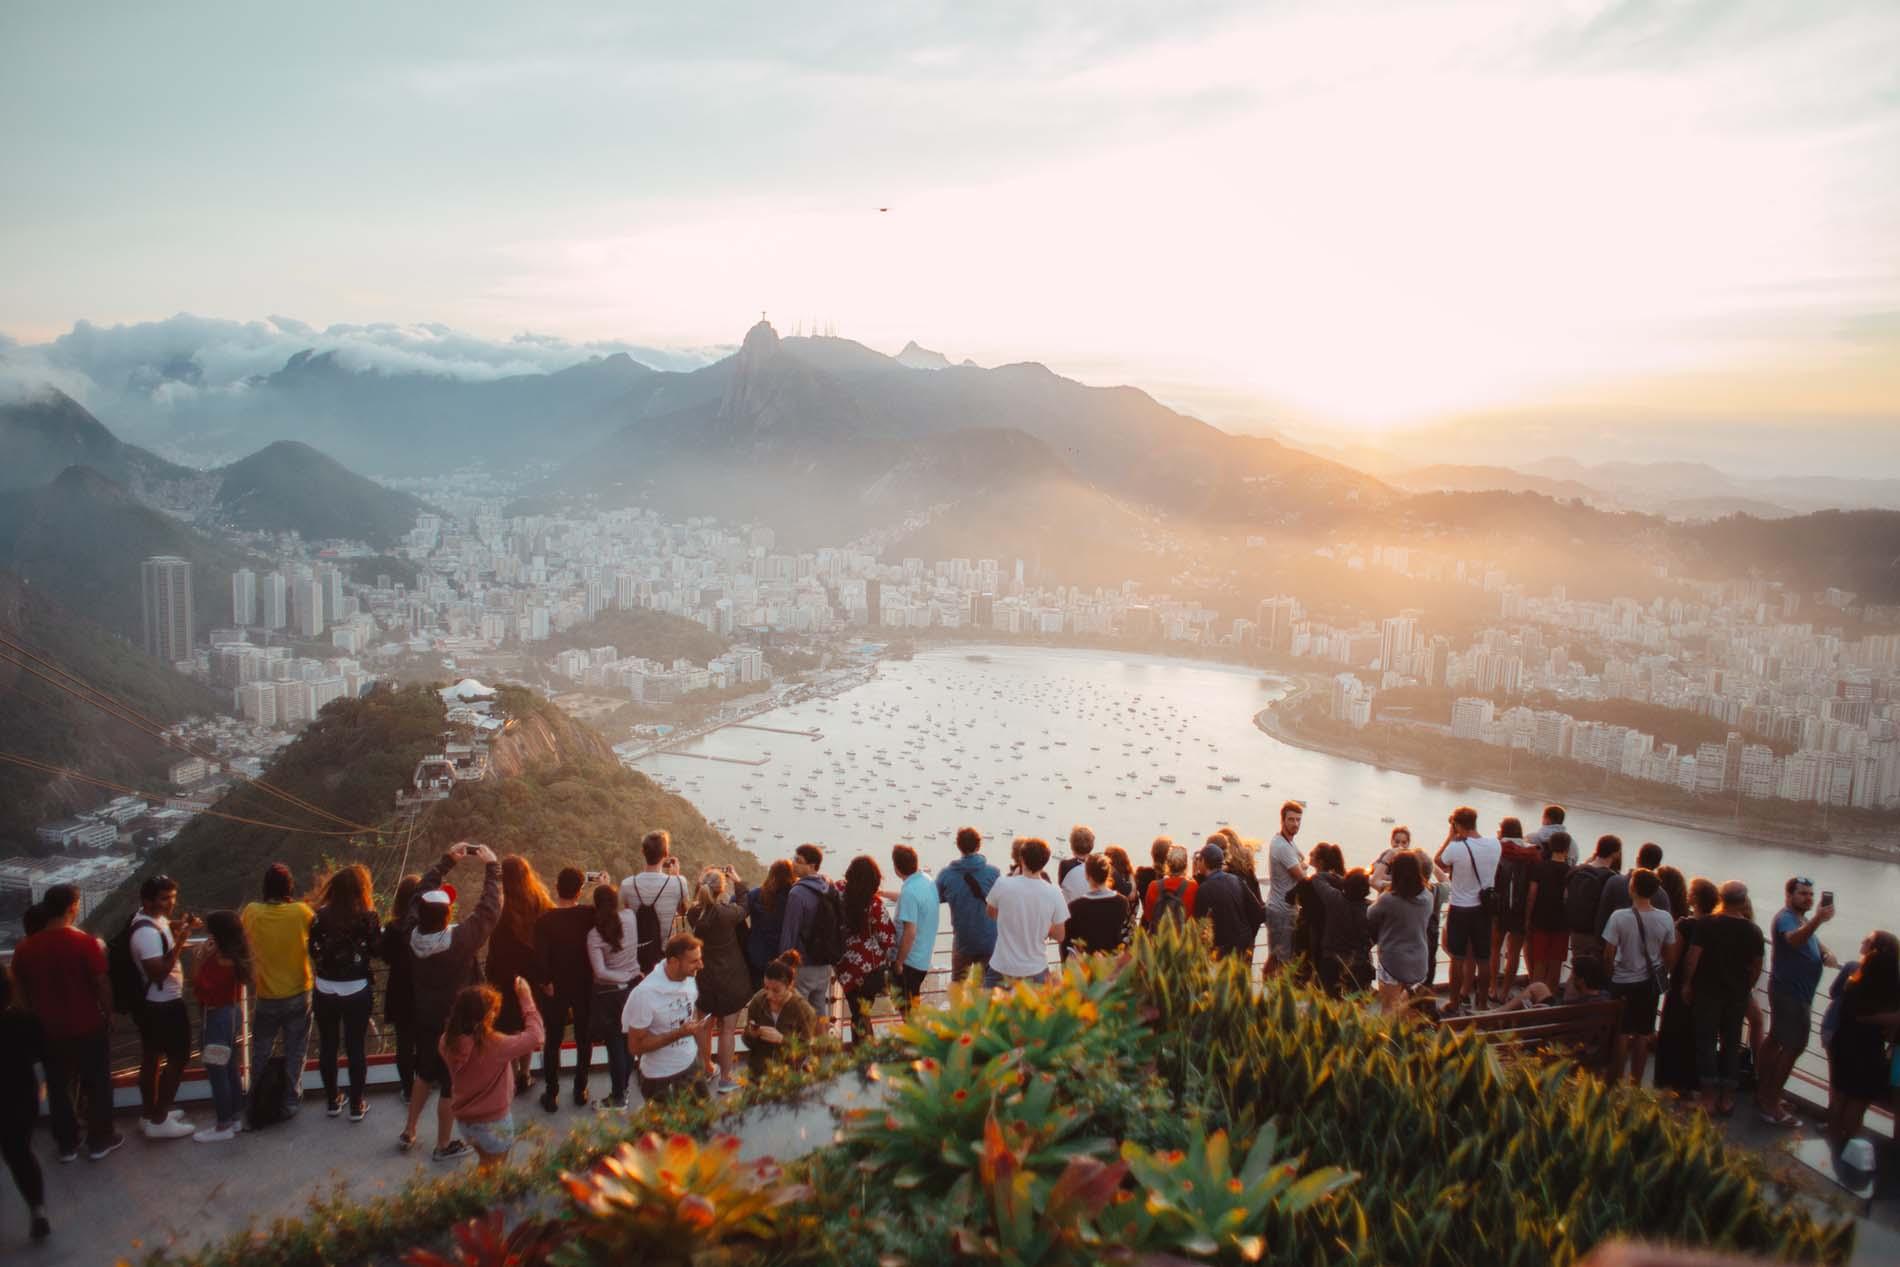 Tourists overlooking a destination.